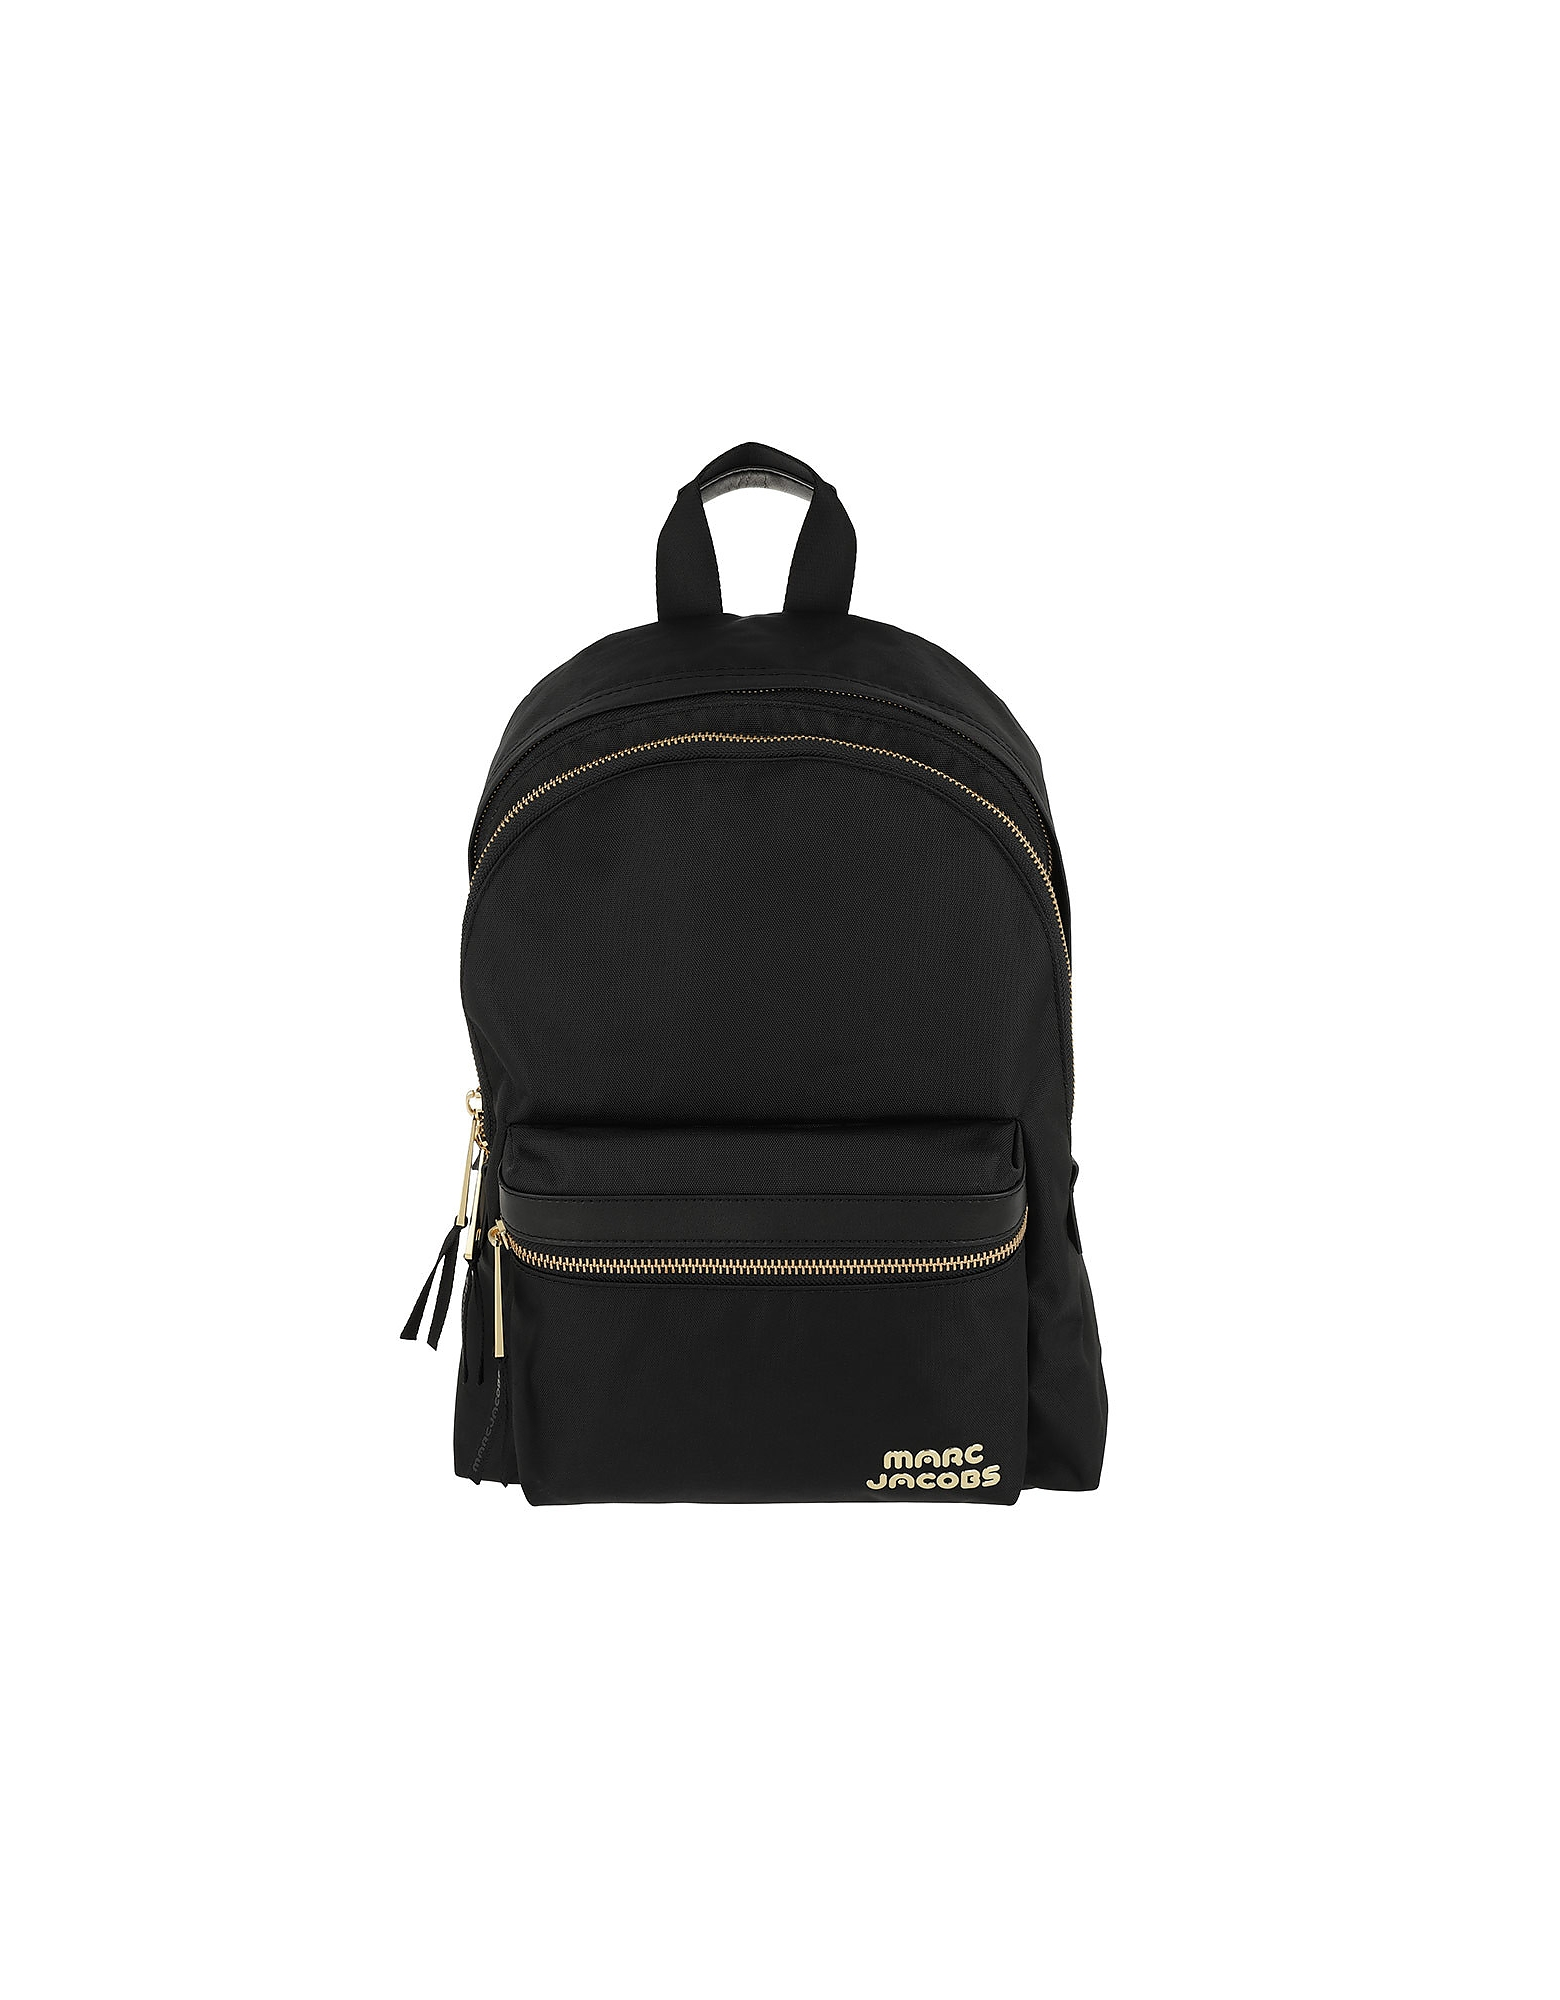 Trek Pack Large Backpack Black